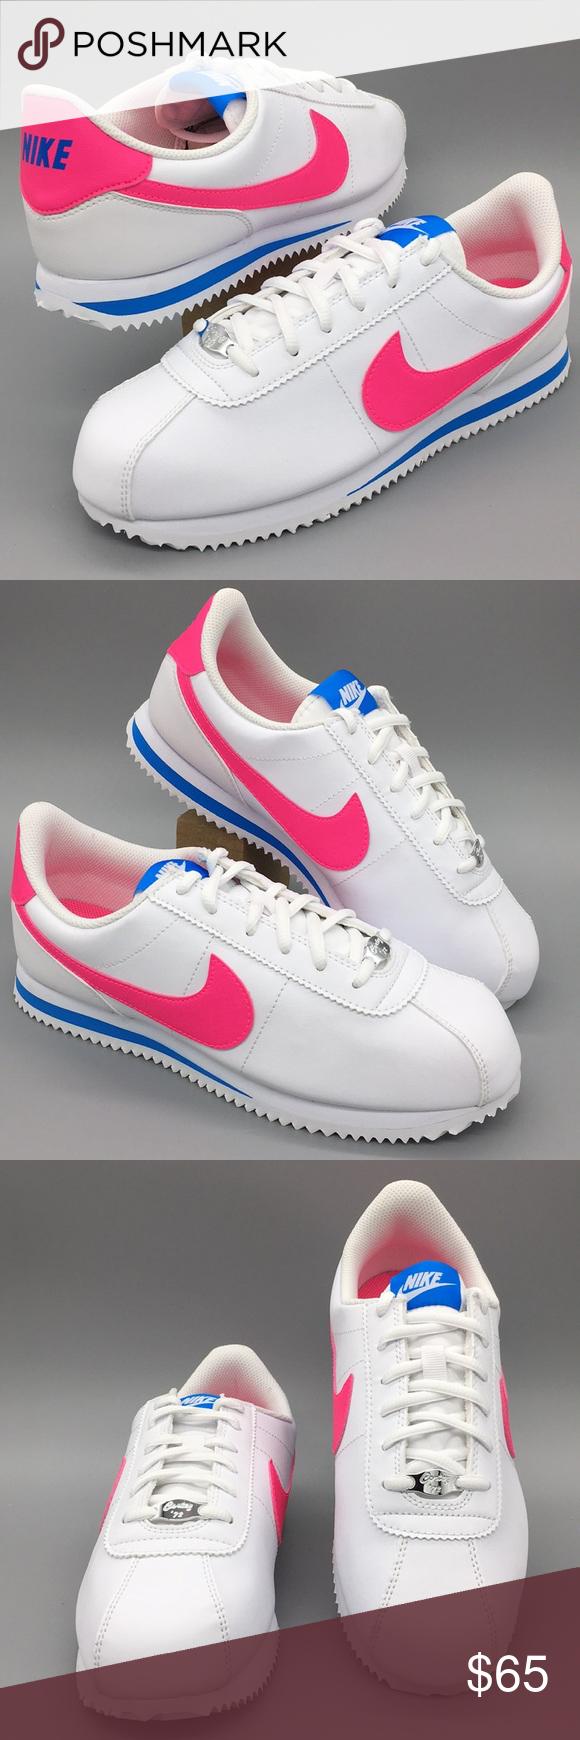 904764 107 Nike Cortez Basic SL White//Hyper Pink-Photo Blue GS